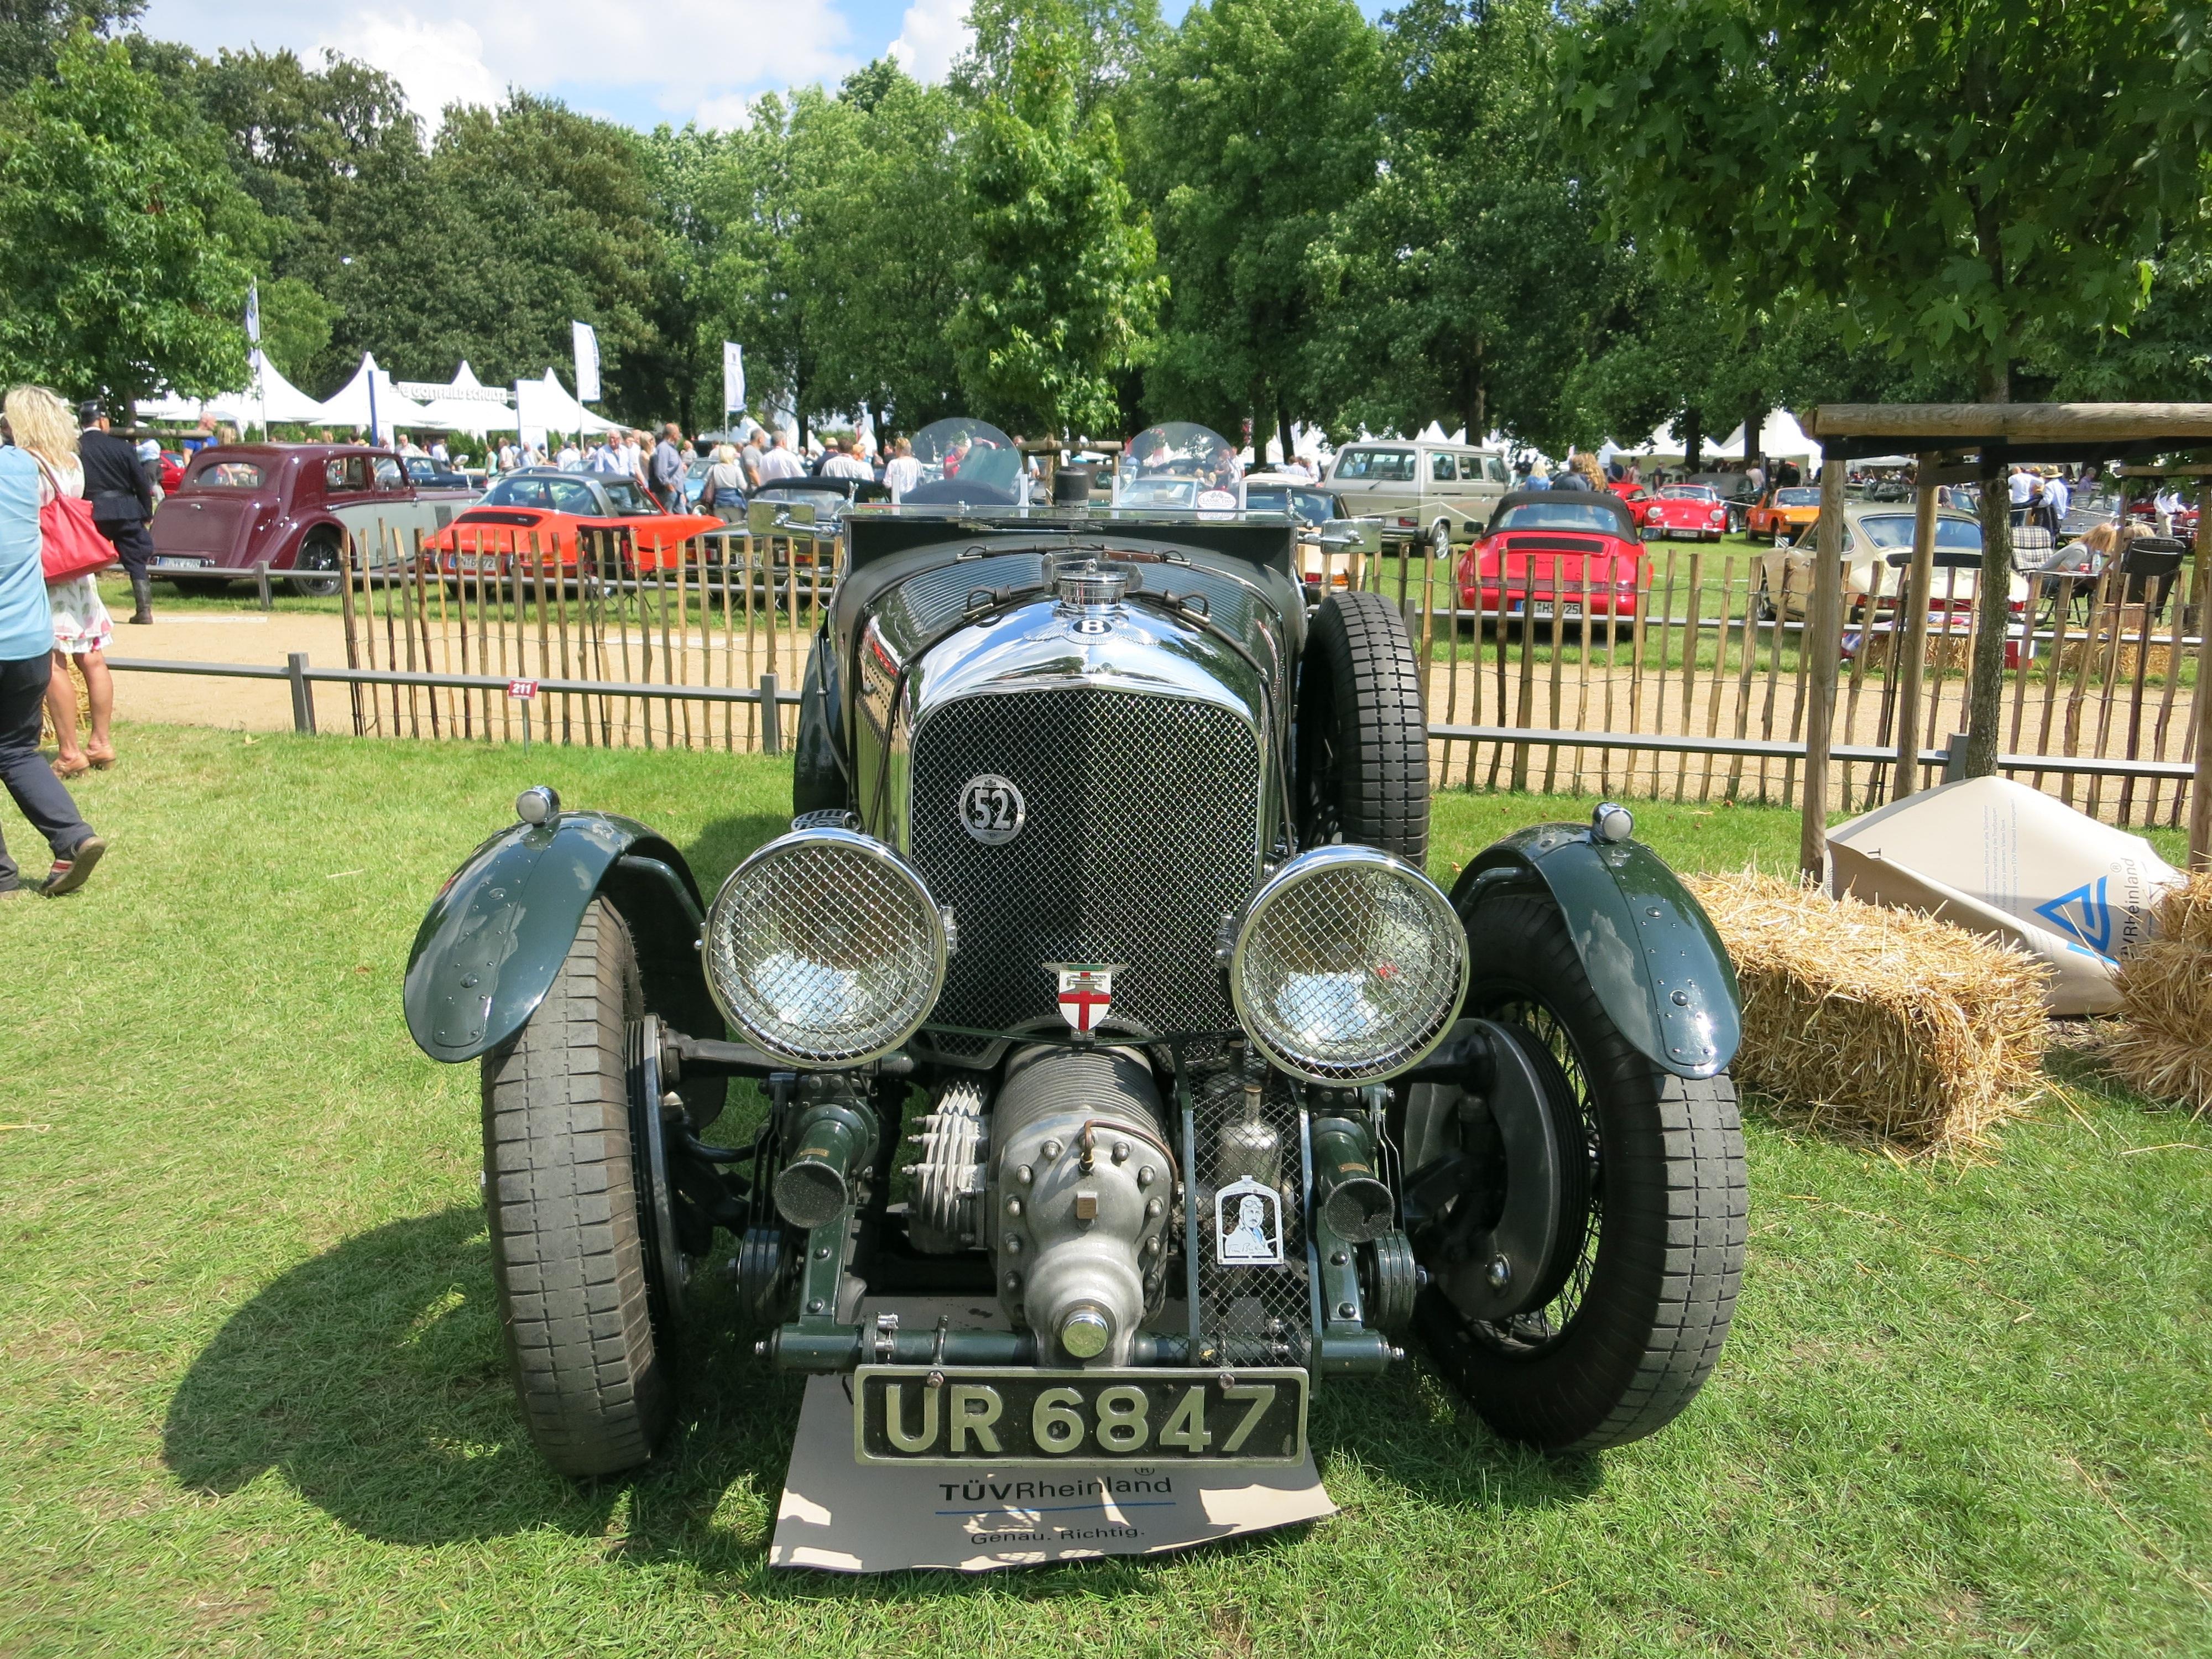 Free Images : sports car, vintage car, race car, oldtimer, autos ...